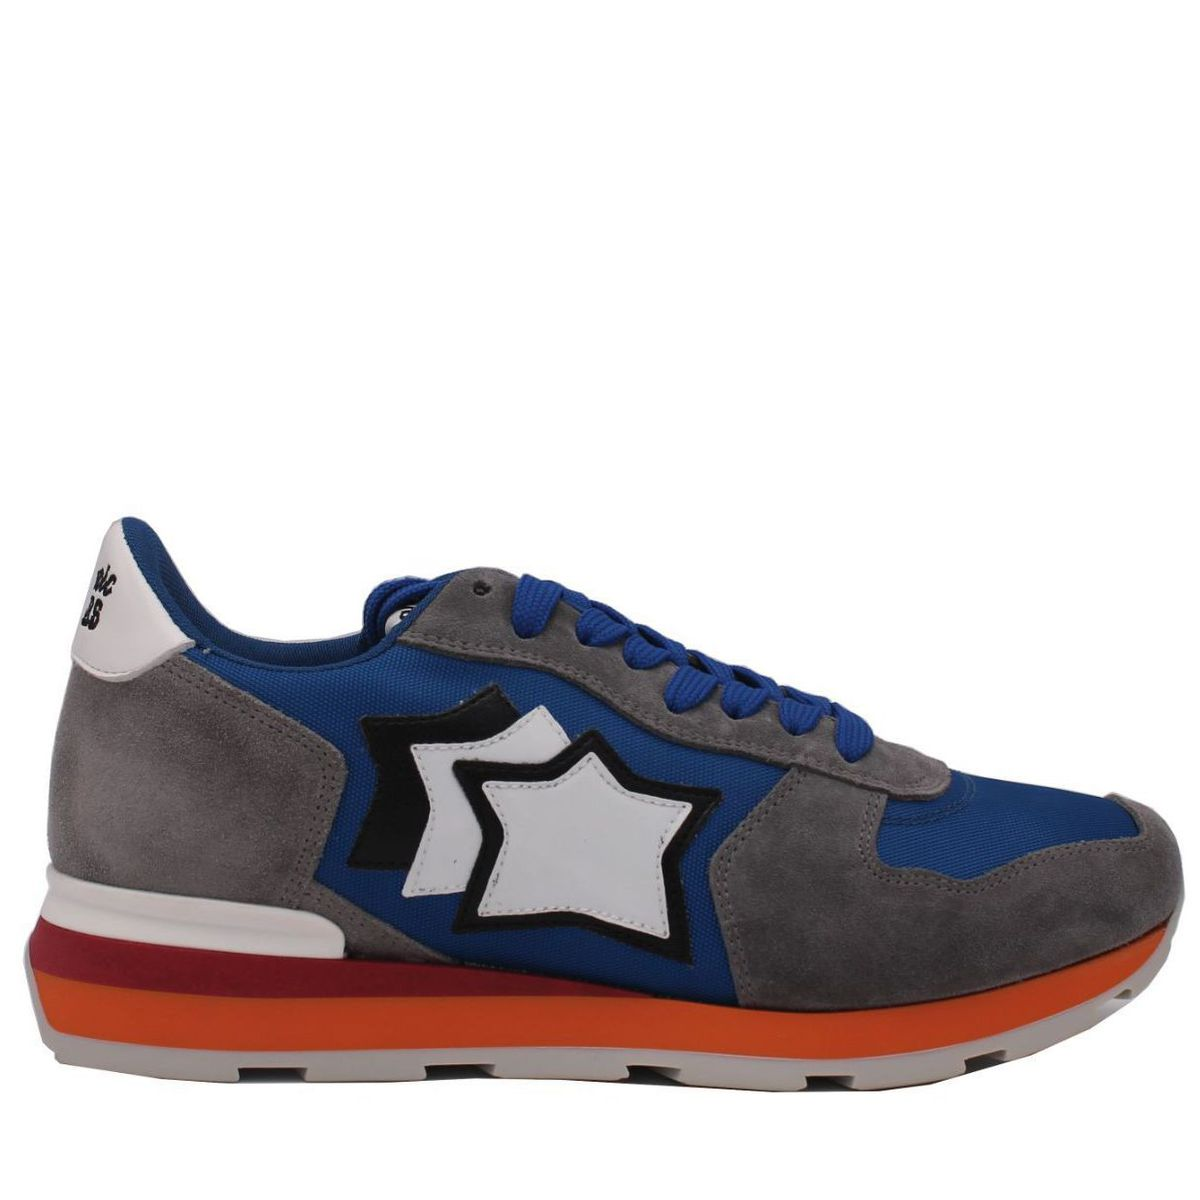 Sneakers modello antares grigio Grigio Atlantic Stars